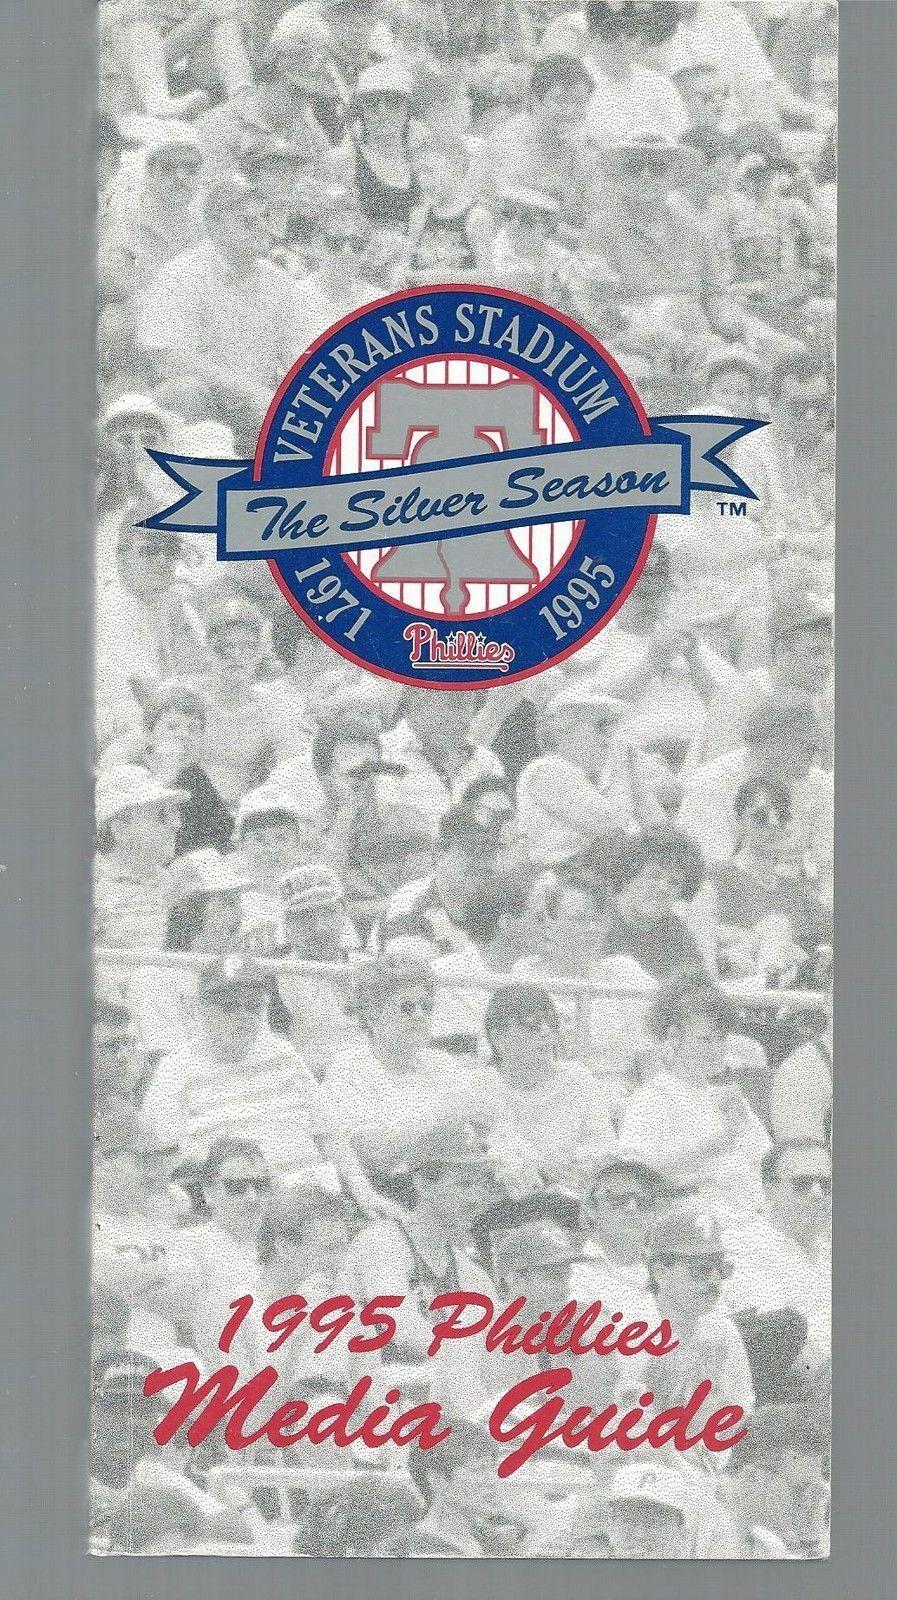 1995 Philadelphia Phillies Baseball MLB Media Guide - Annual Player Information